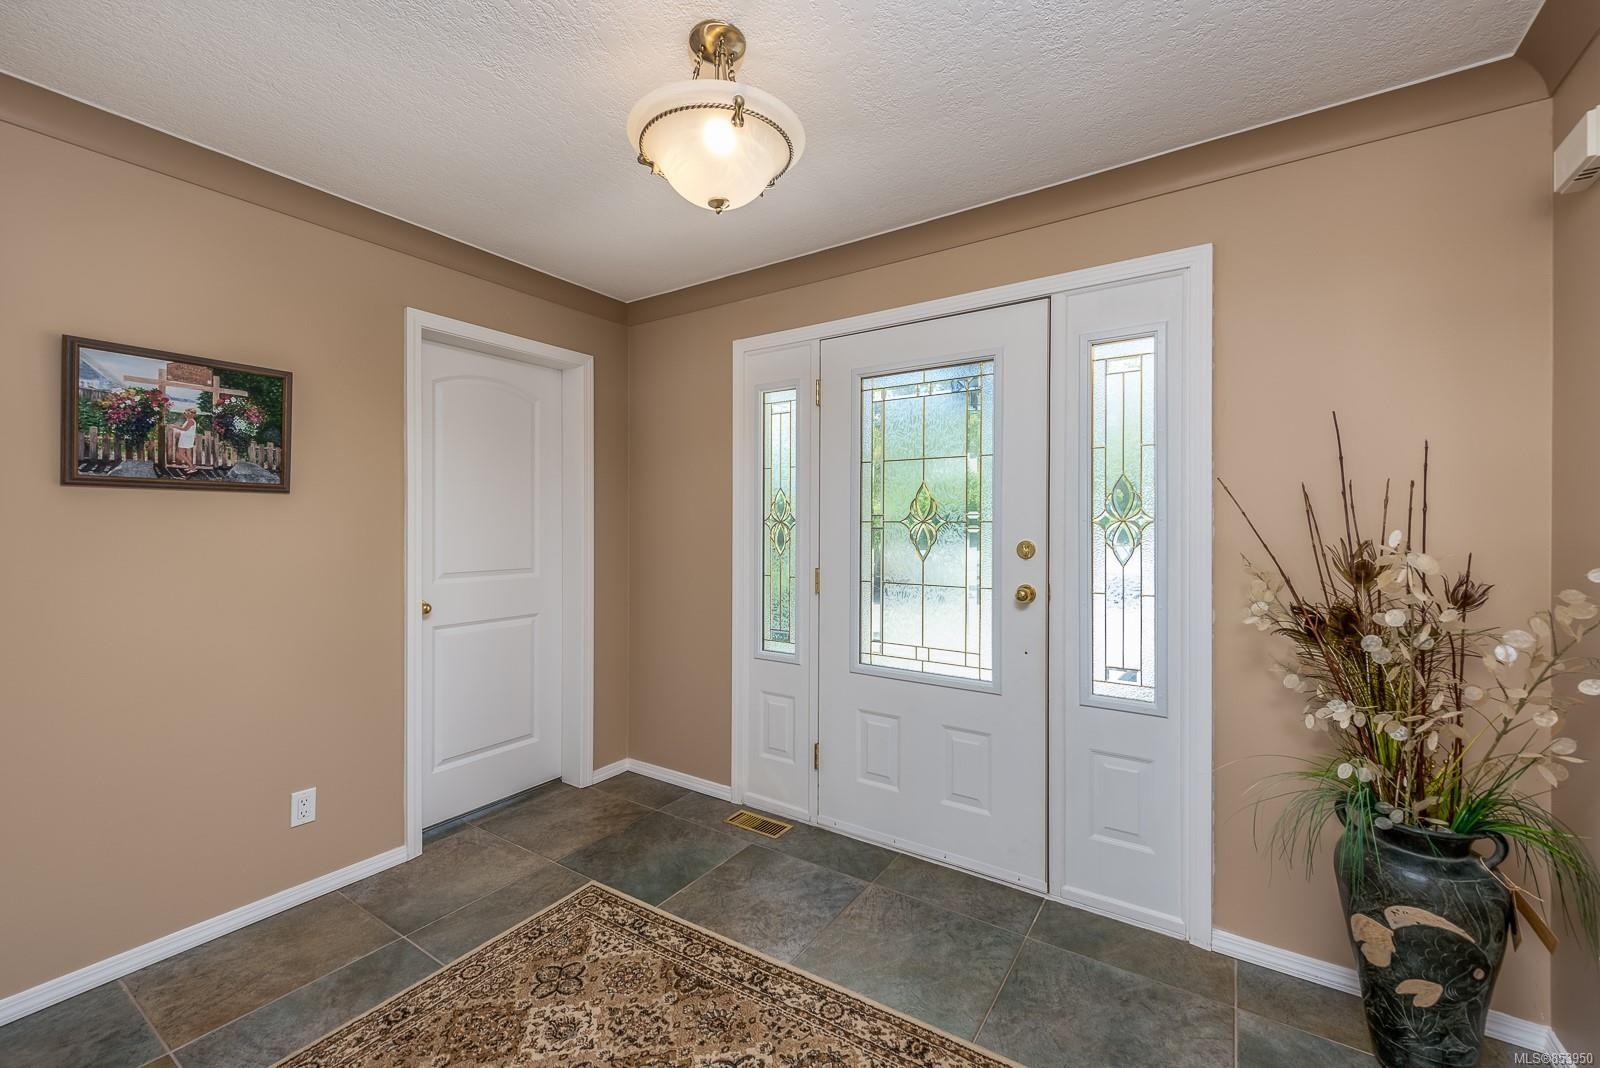 Photo 13: Photos: 5880 GARVIN Rd in : CV Union Bay/Fanny Bay House for sale (Comox Valley)  : MLS®# 853950